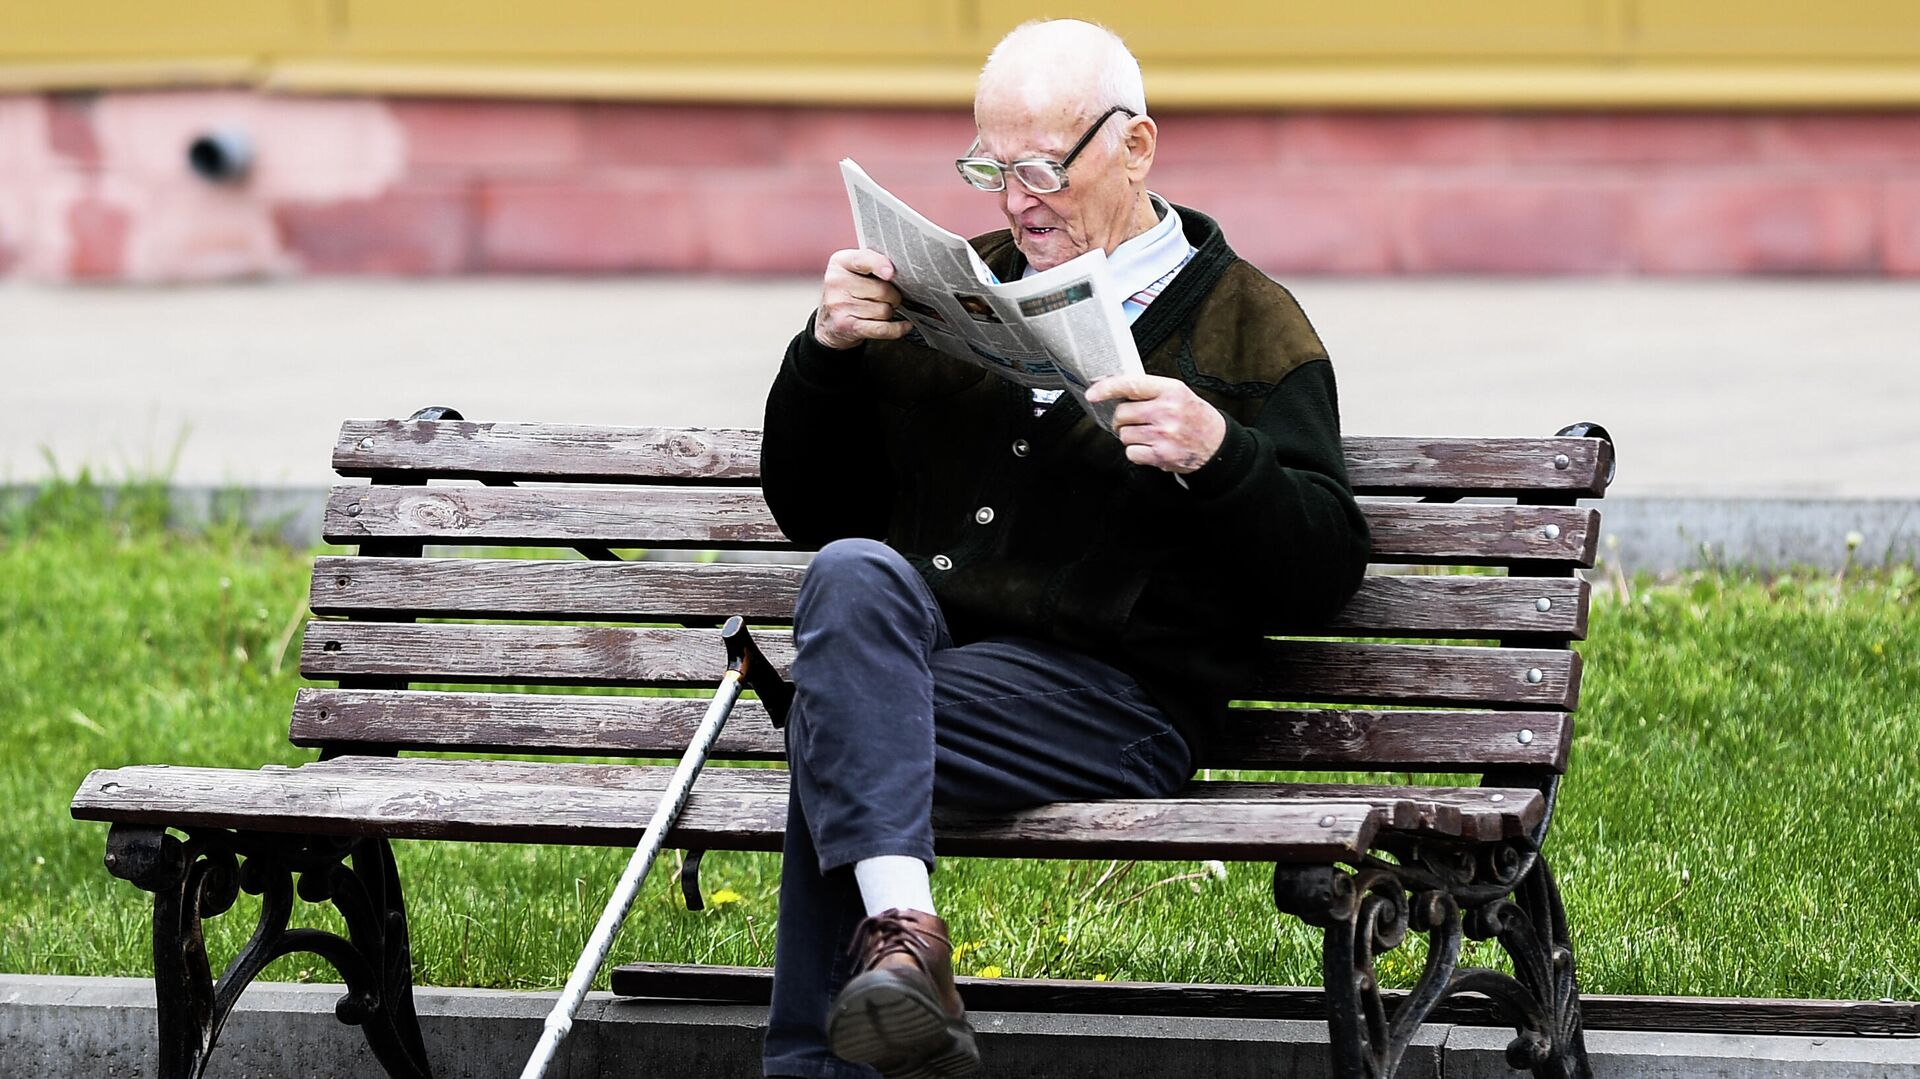 Мужчина читает газету на улице на лавочке в Москве - РИА Новости, 1920, 21.09.2020